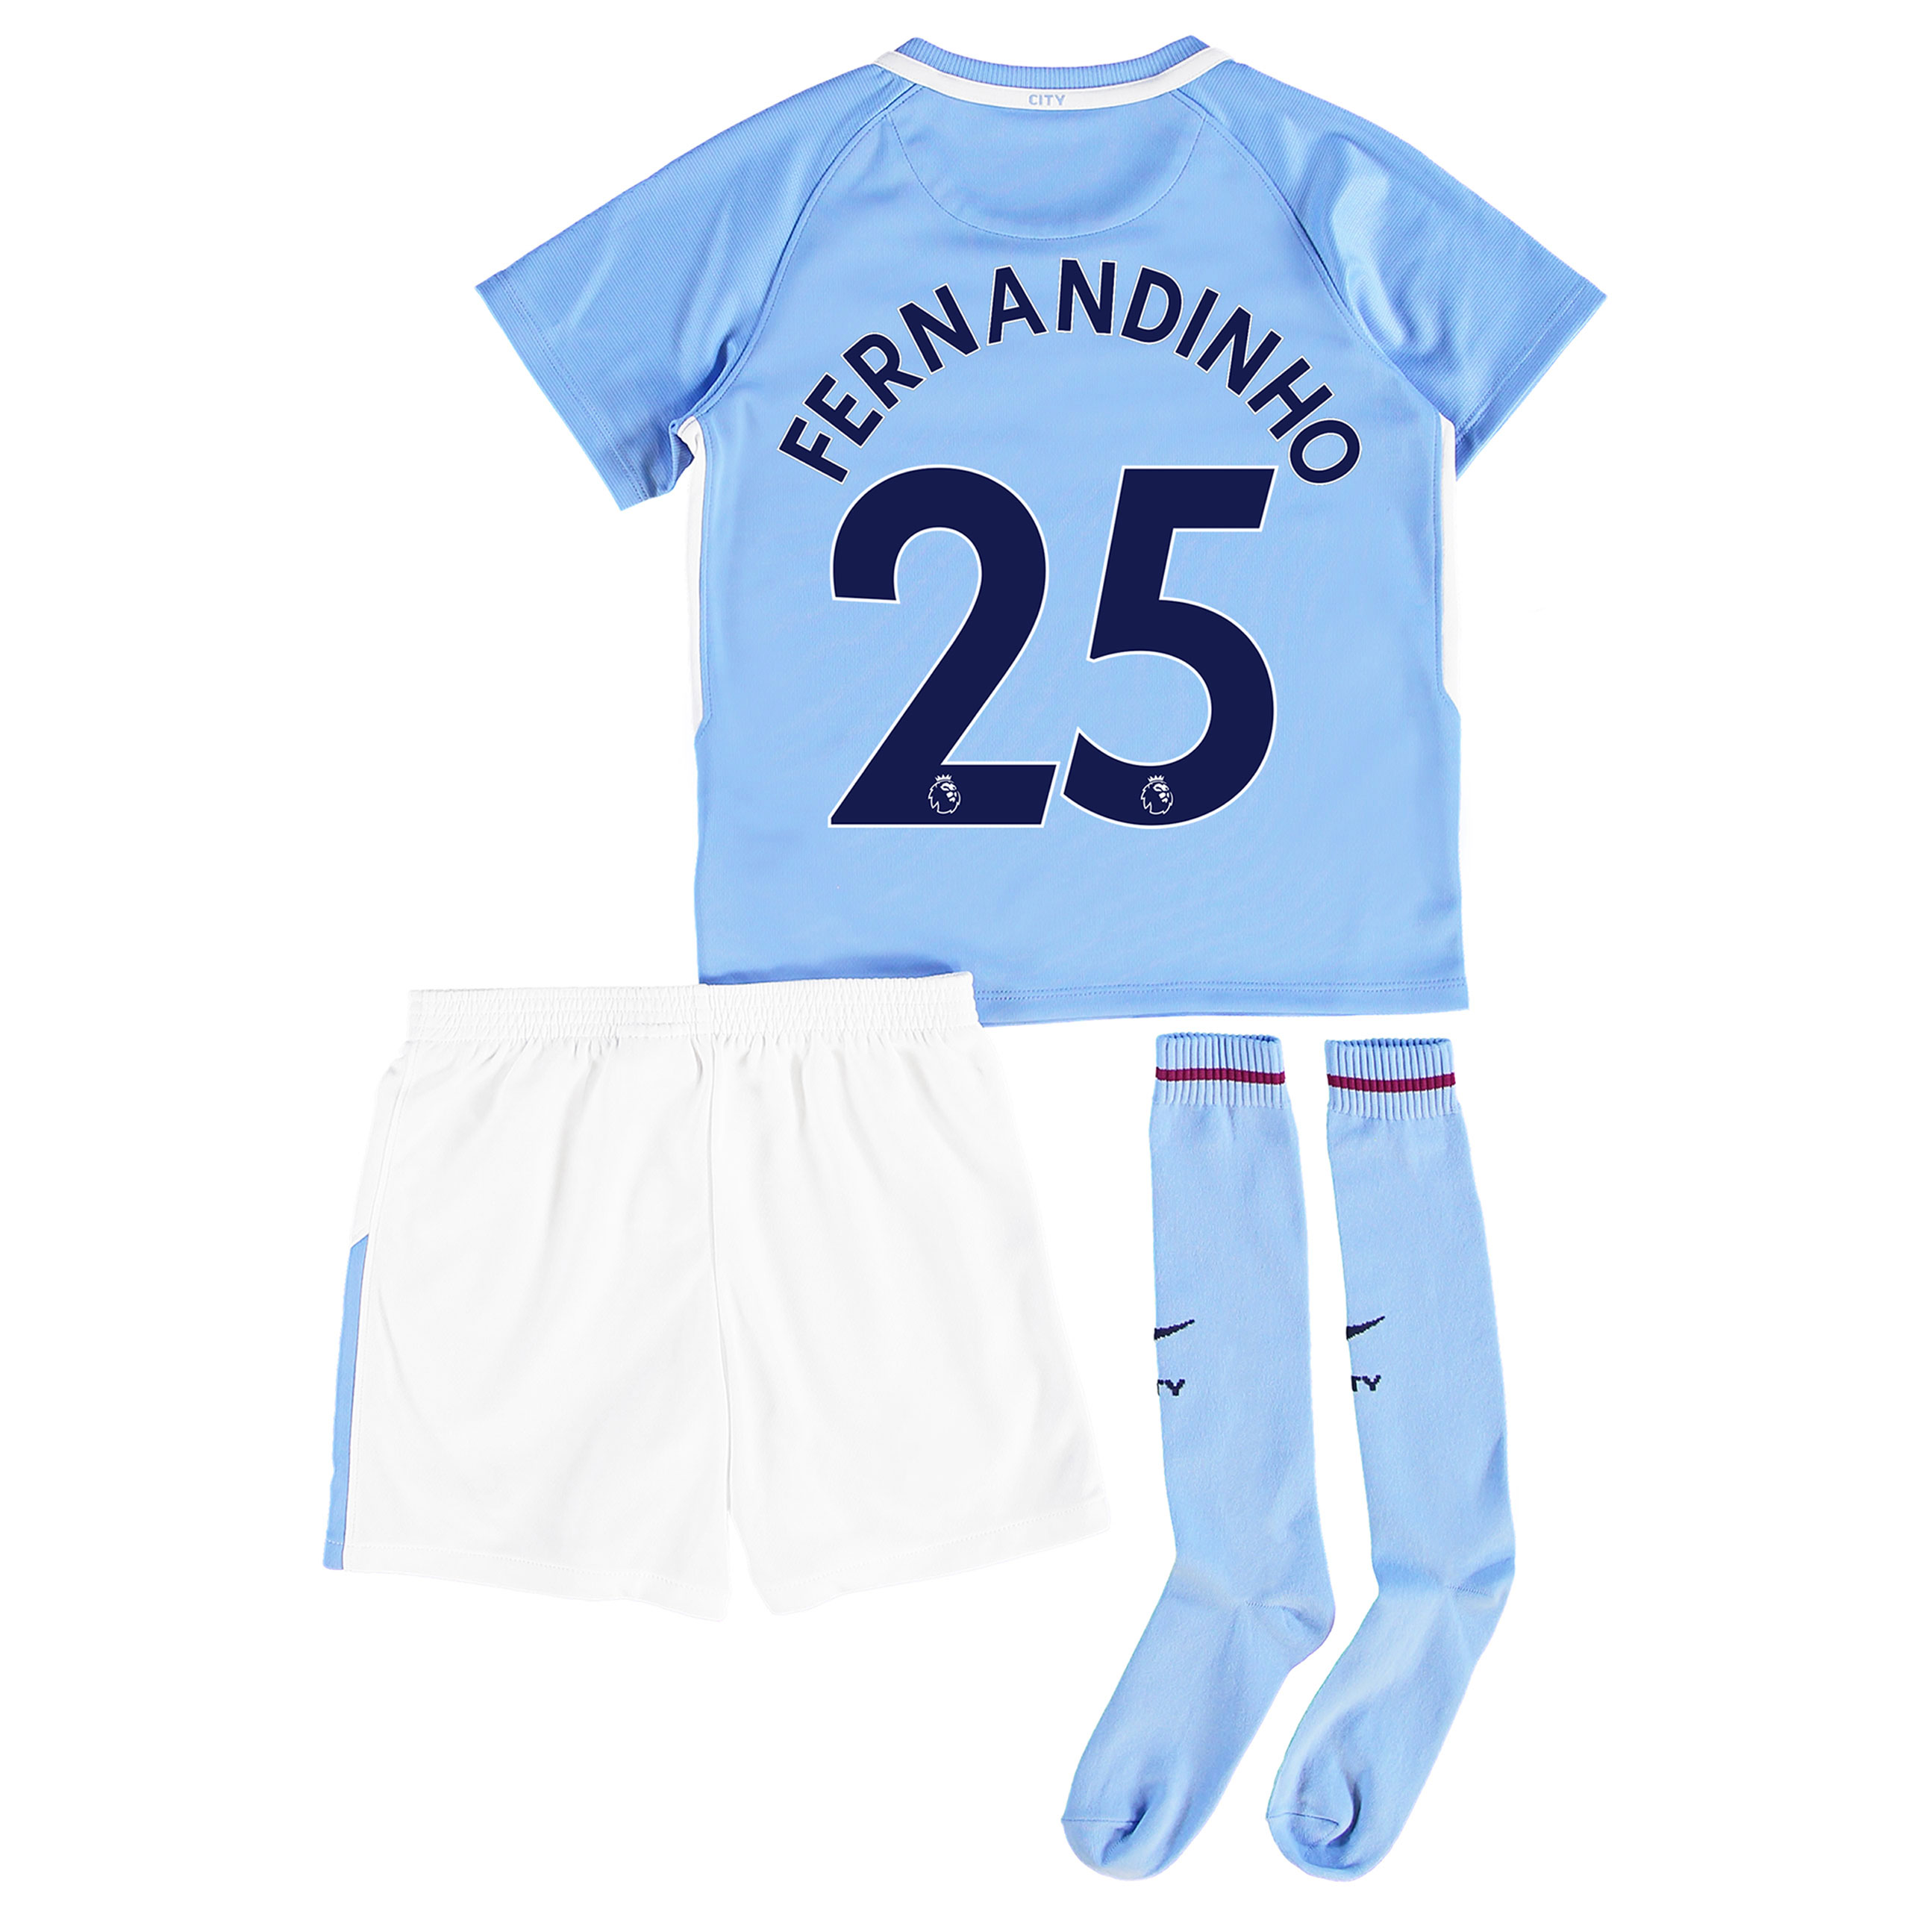 Manchester City Home Stadium Kit 2017-18 - Little Kids with Fernandinh